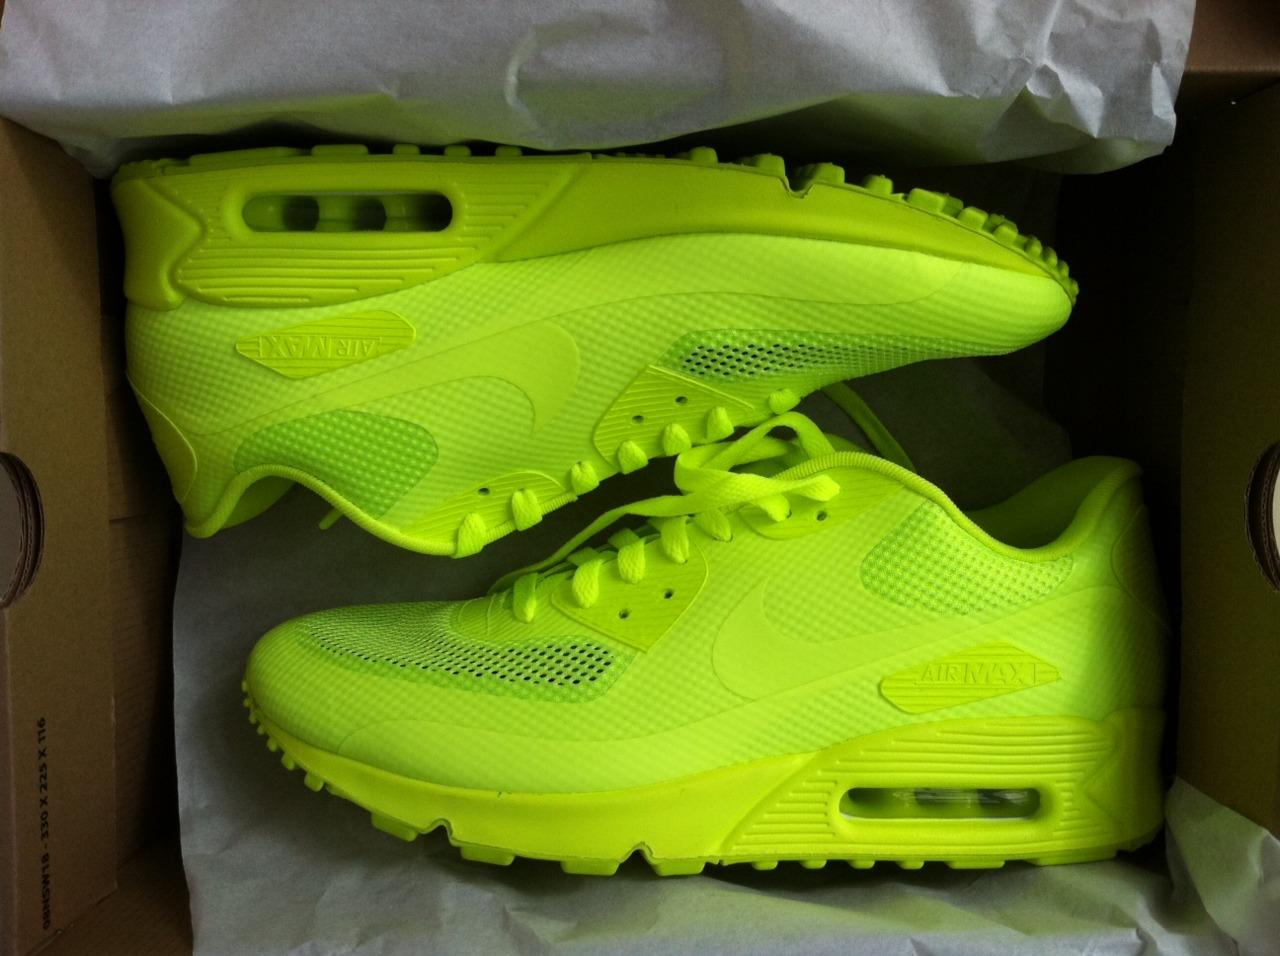 quality design 239ed fa6da ... usa sale yellow neon green black nike air max shoes lovense u2014 card  from user in